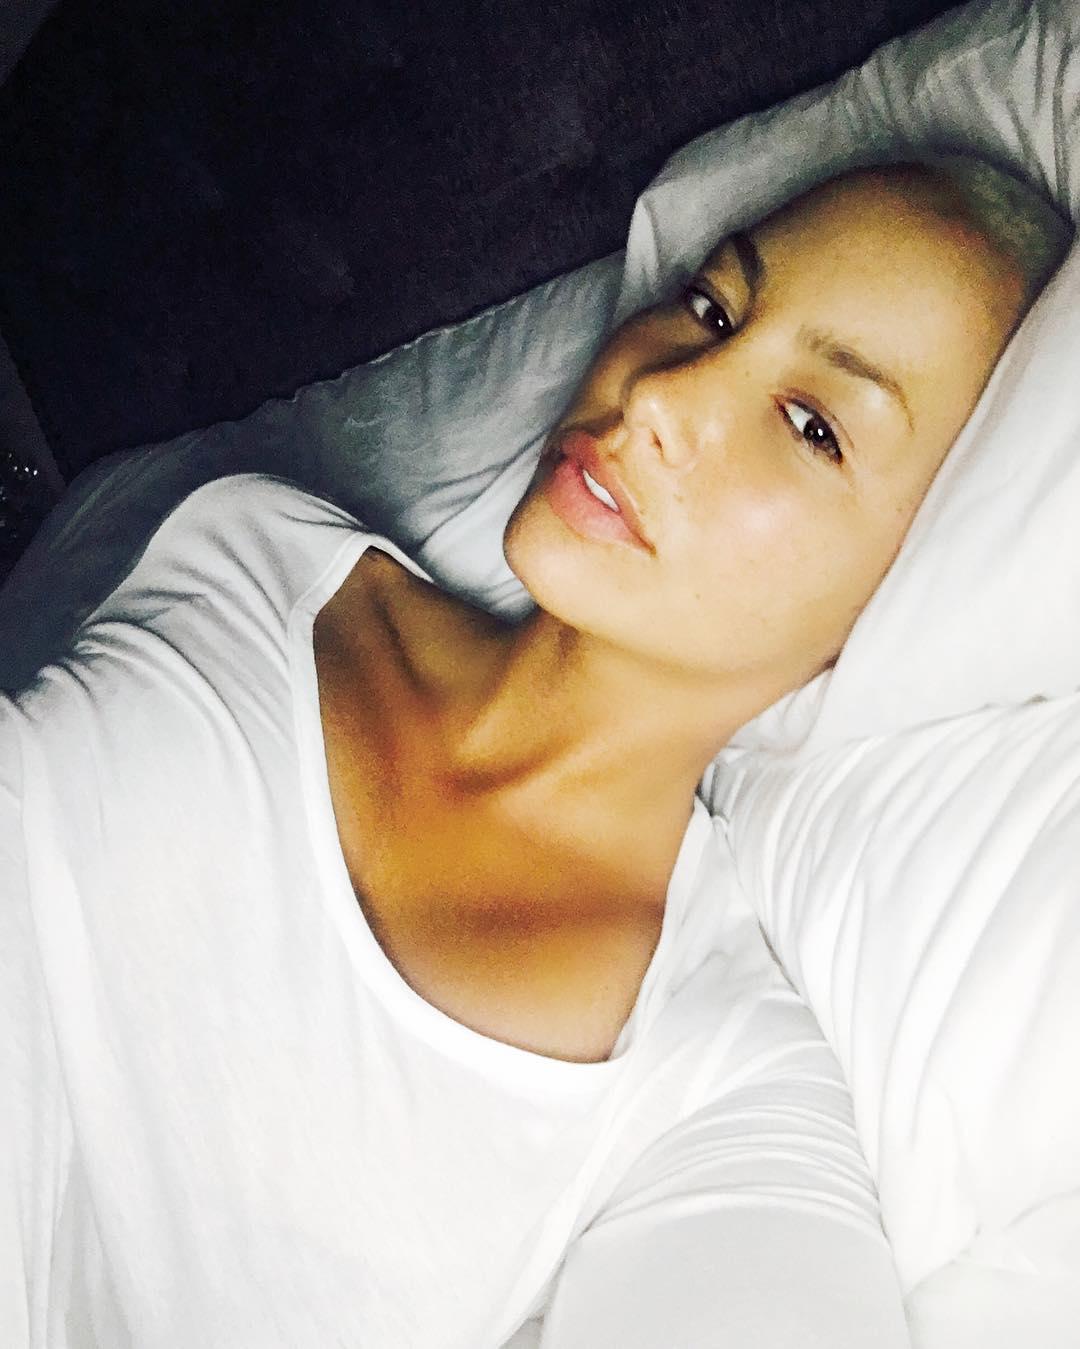 Amber Rose Makeup-Free Selfie